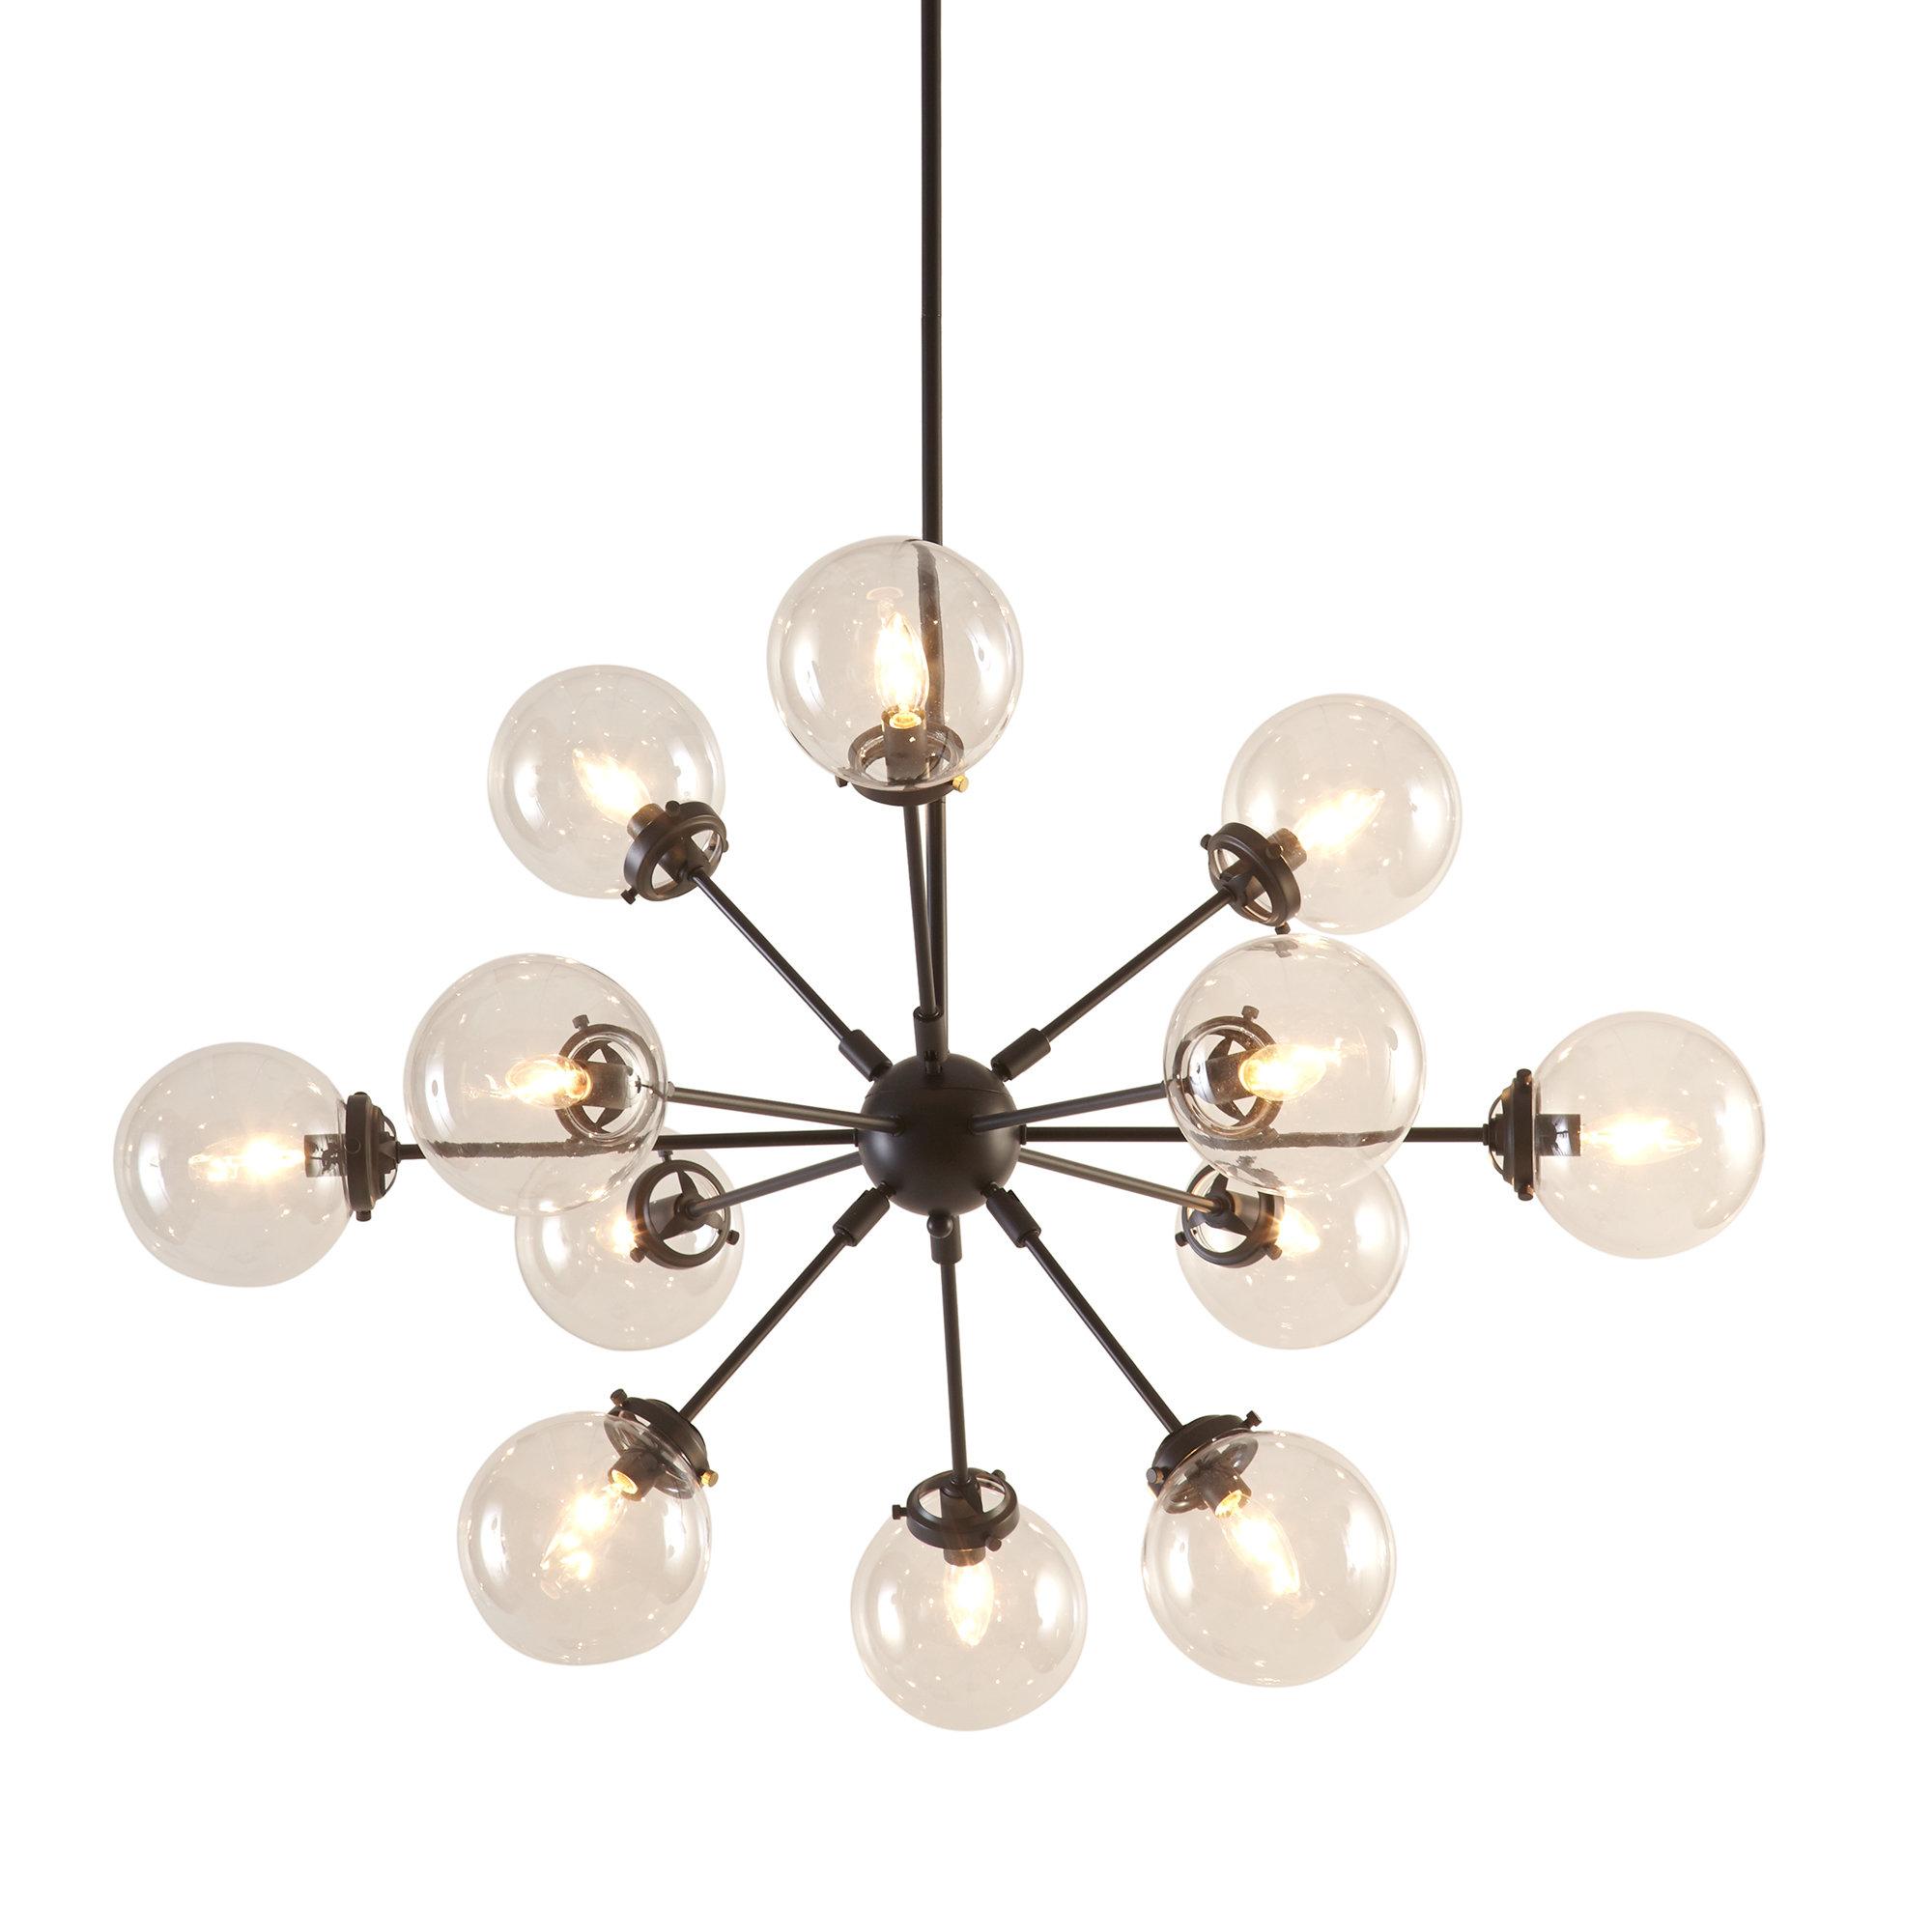 Nelly 12-Light Sputnik Chandeliers with regard to Favorite Modern Rustic Interiors Asher 12-Light Sputnik Chandelier